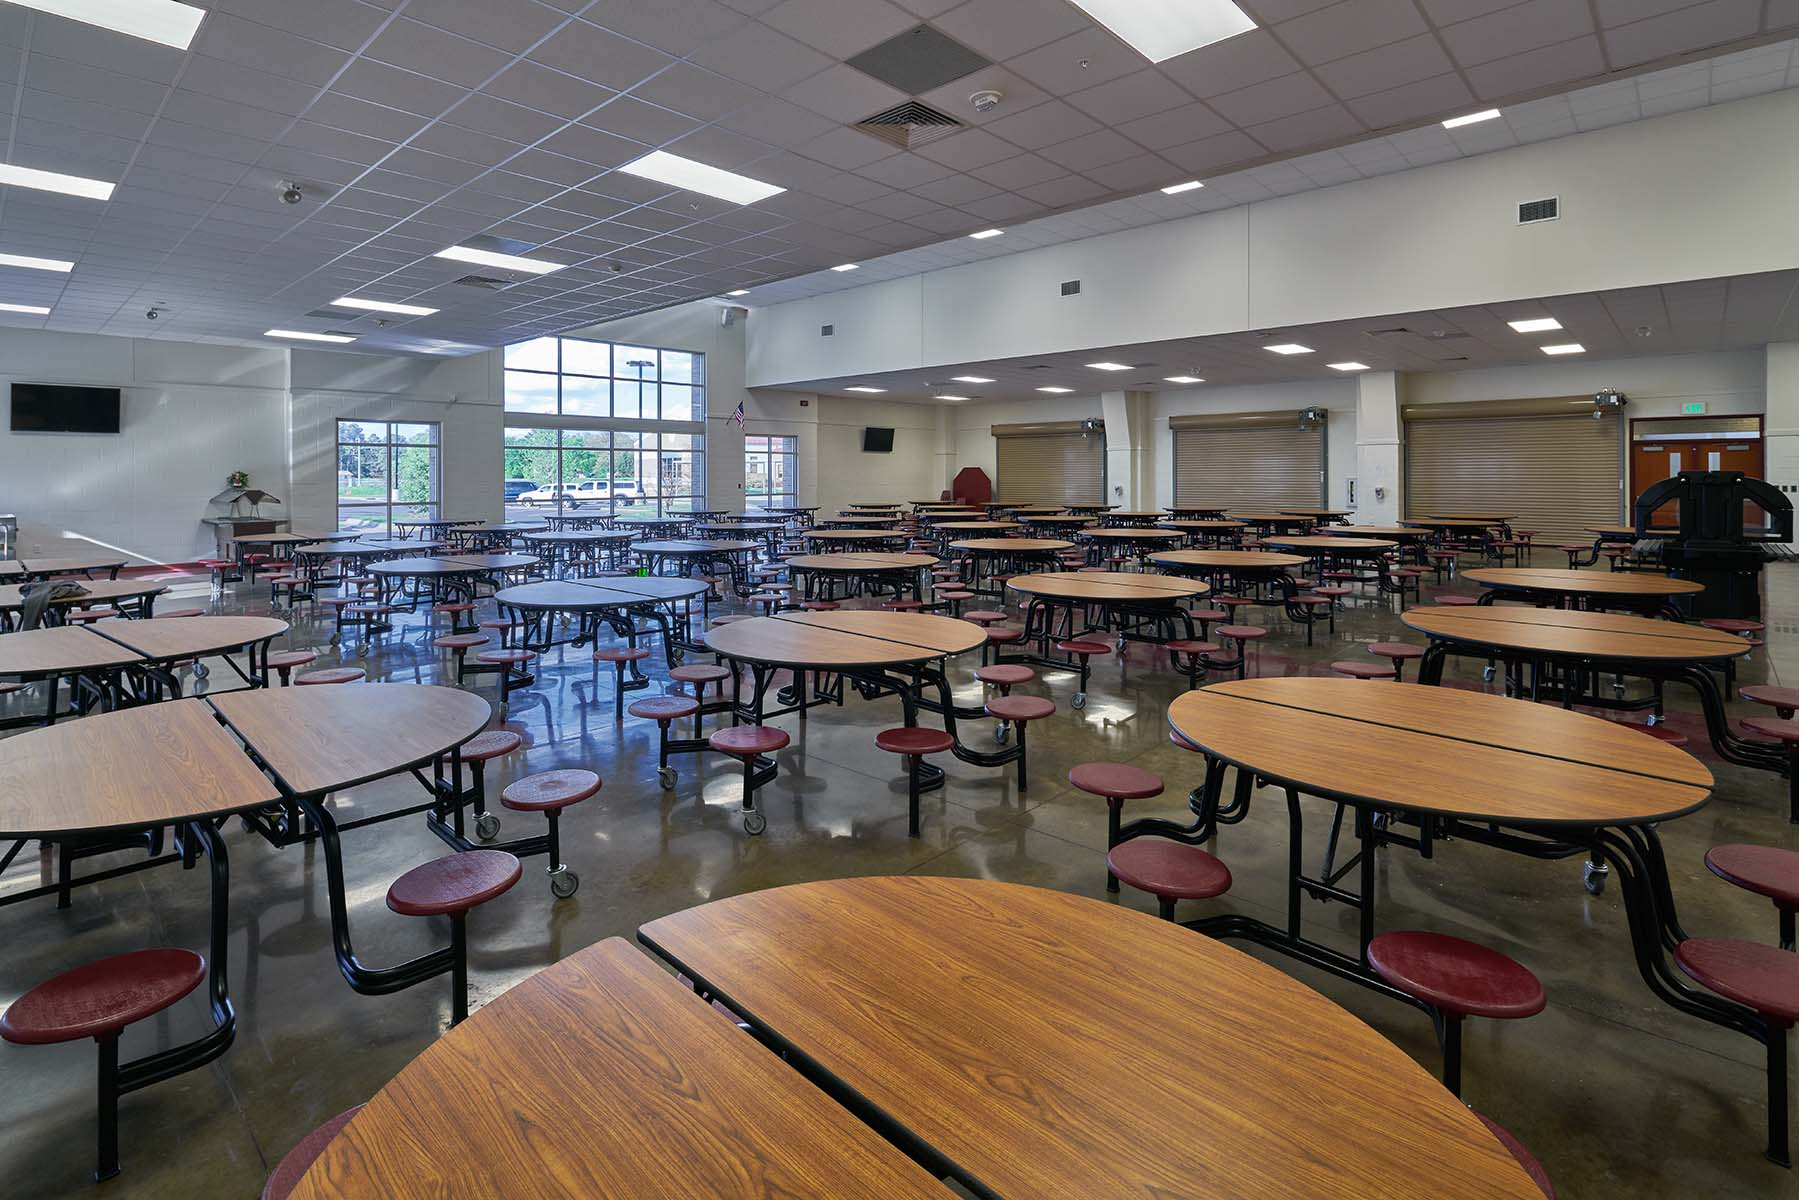 Lake Hamilton Middle School